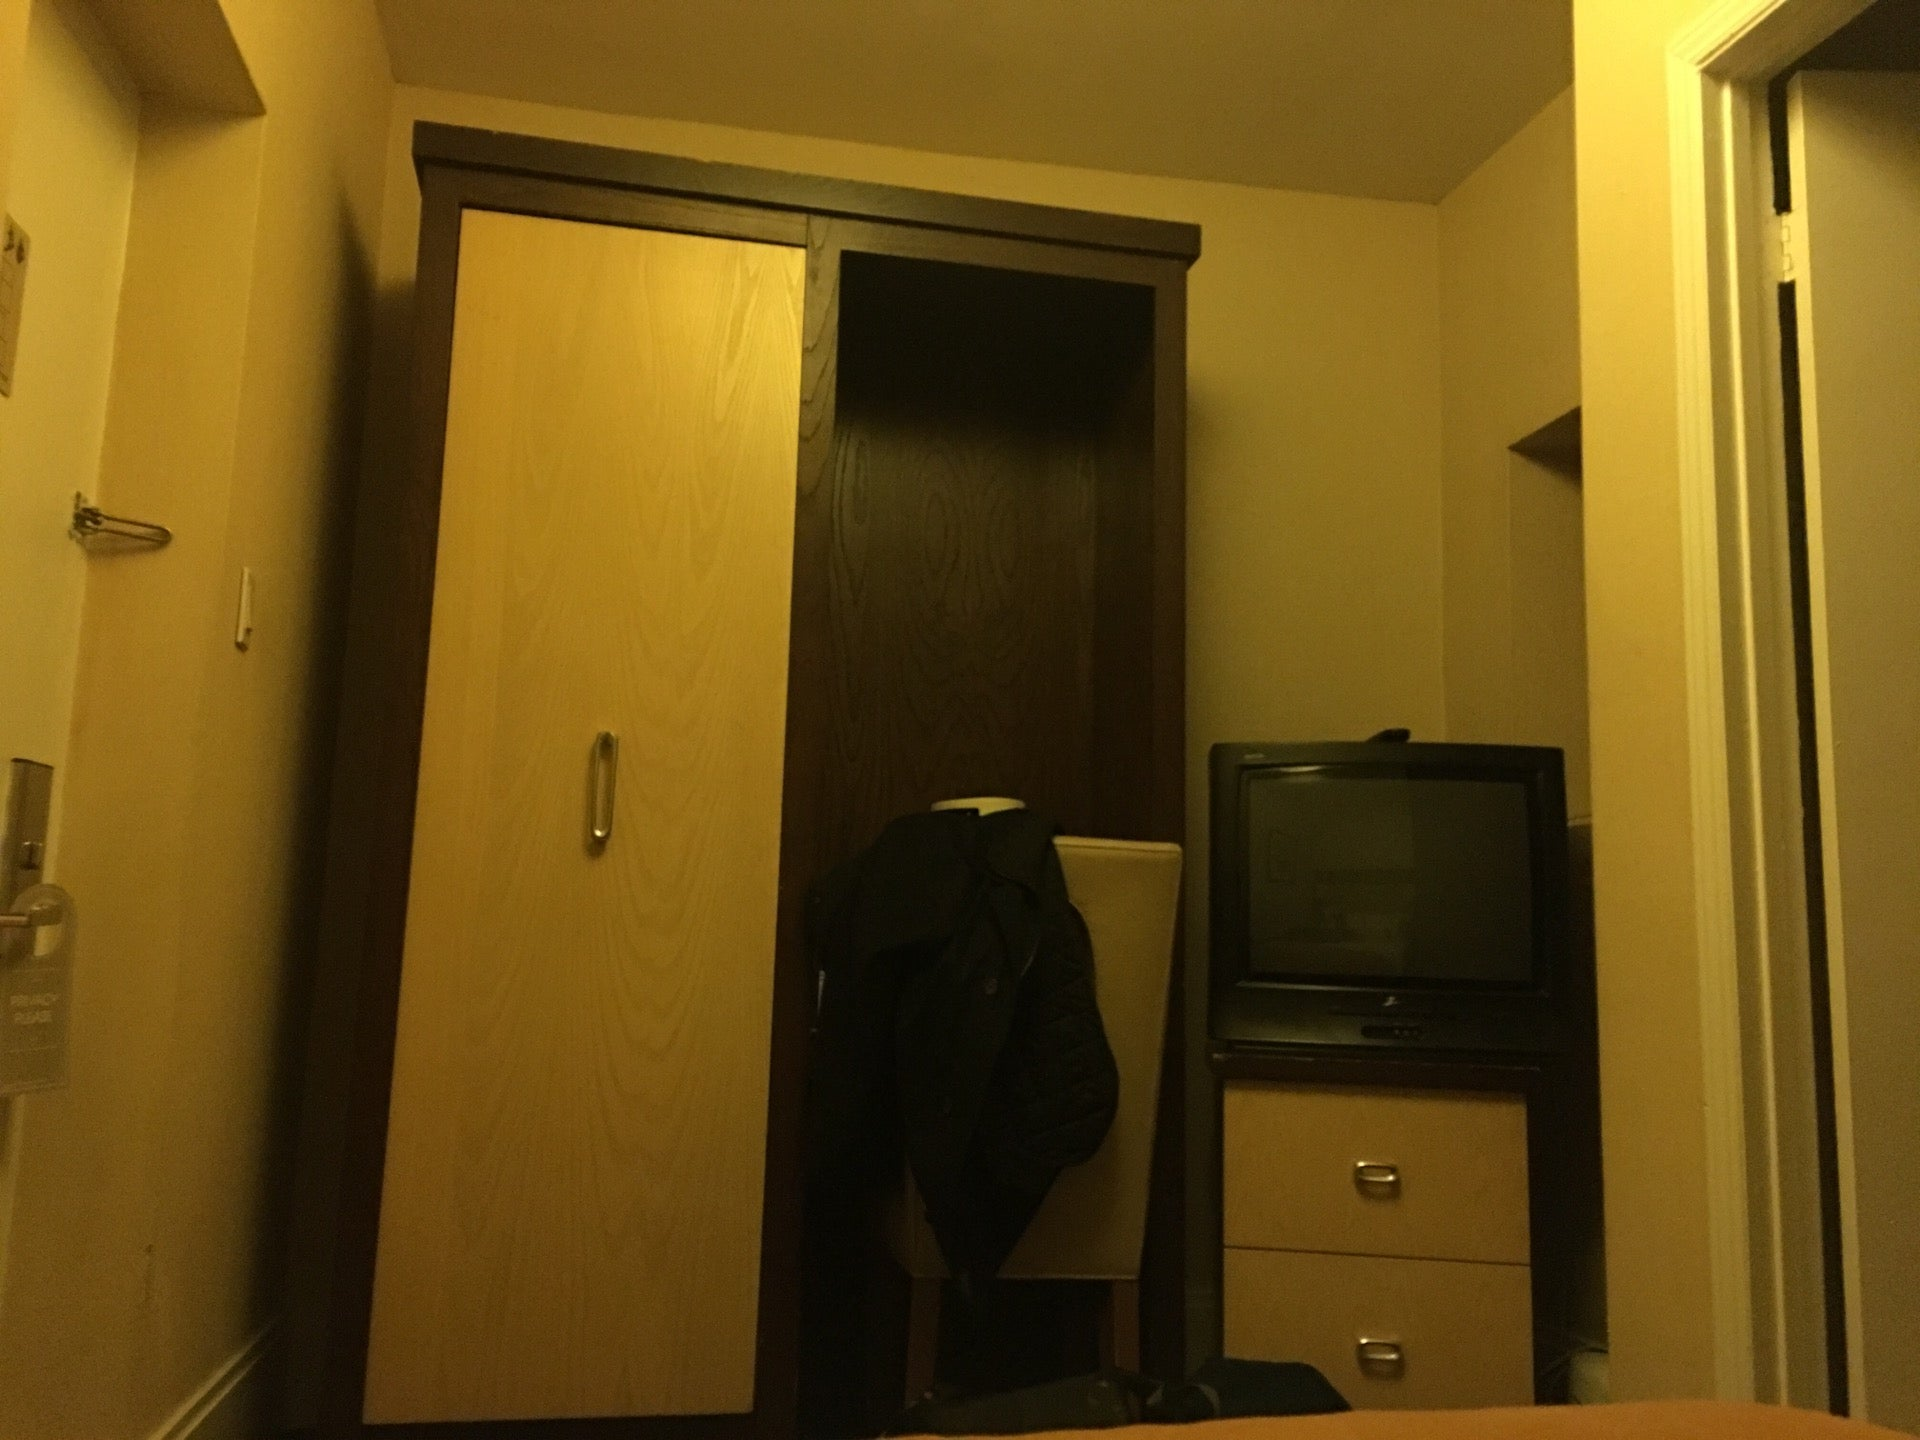 Amsterdam Court Hotel, amsterdam hospitality, hotel,amsterdam court hotel,nyc